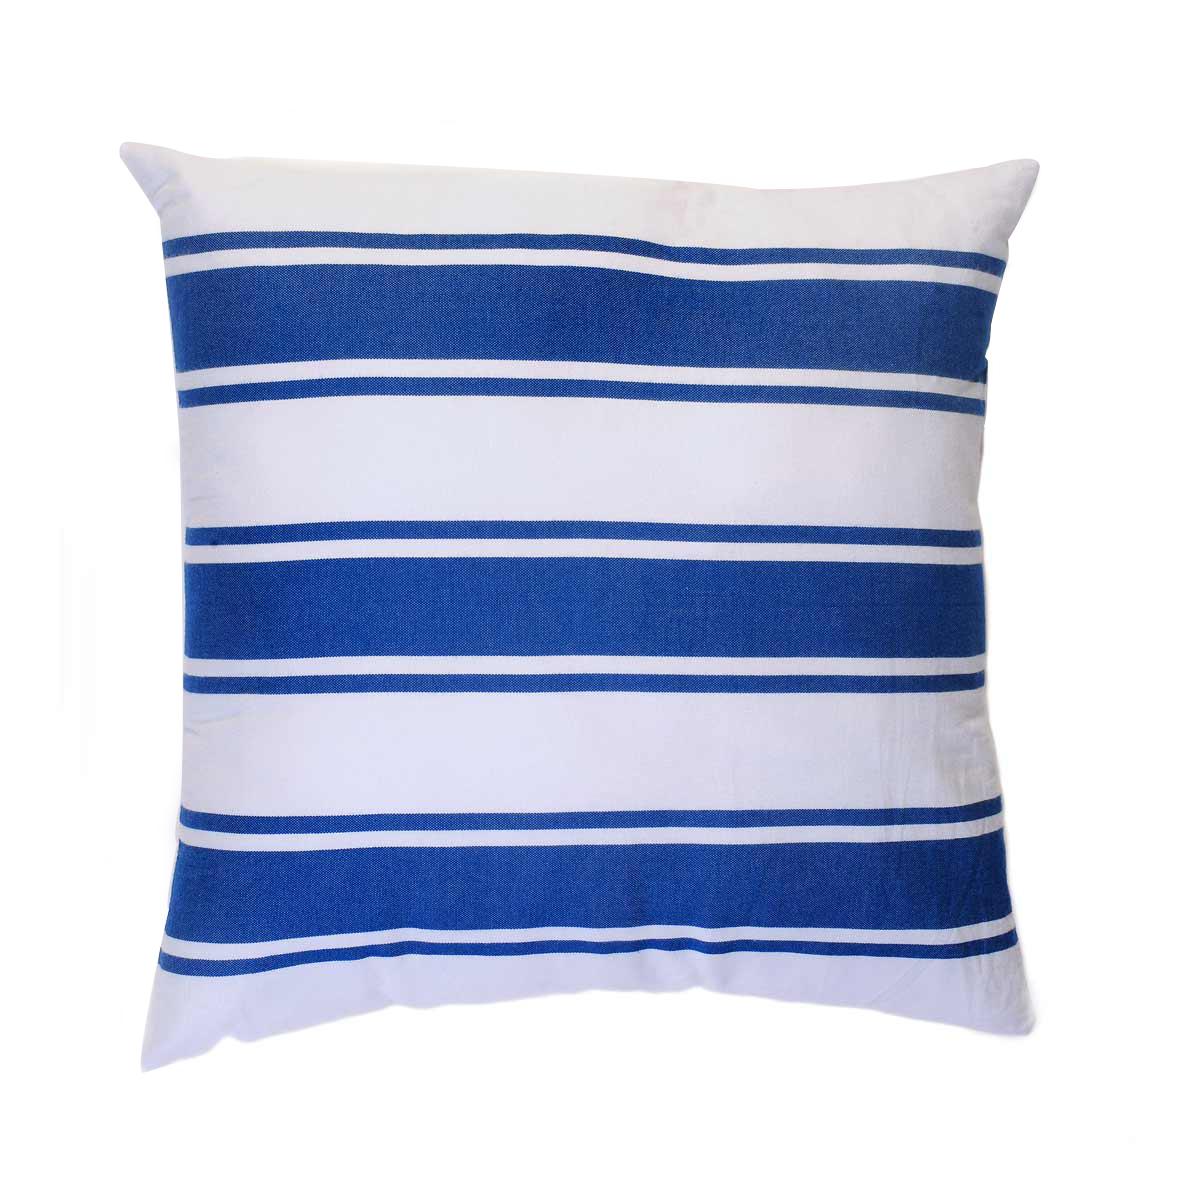 CASABLANCA - Housse de coussin coton rayures bleu fond blanc 40 x 40